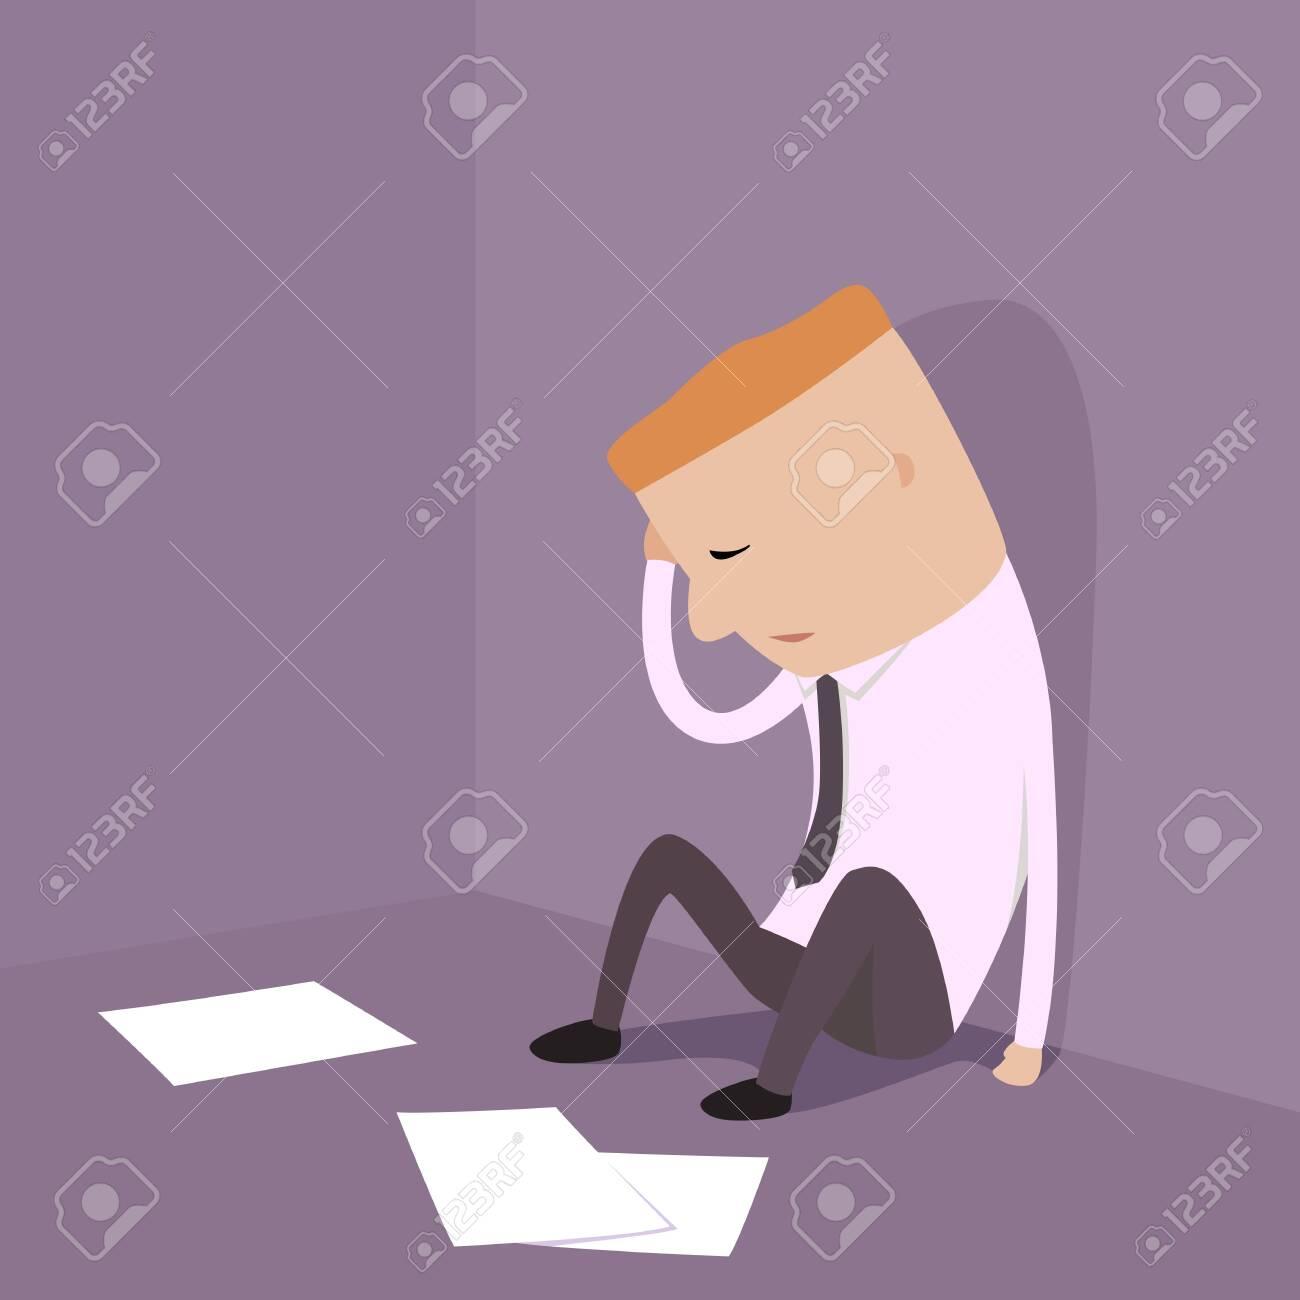 Businessman who bankruptcy illustration - 26375505